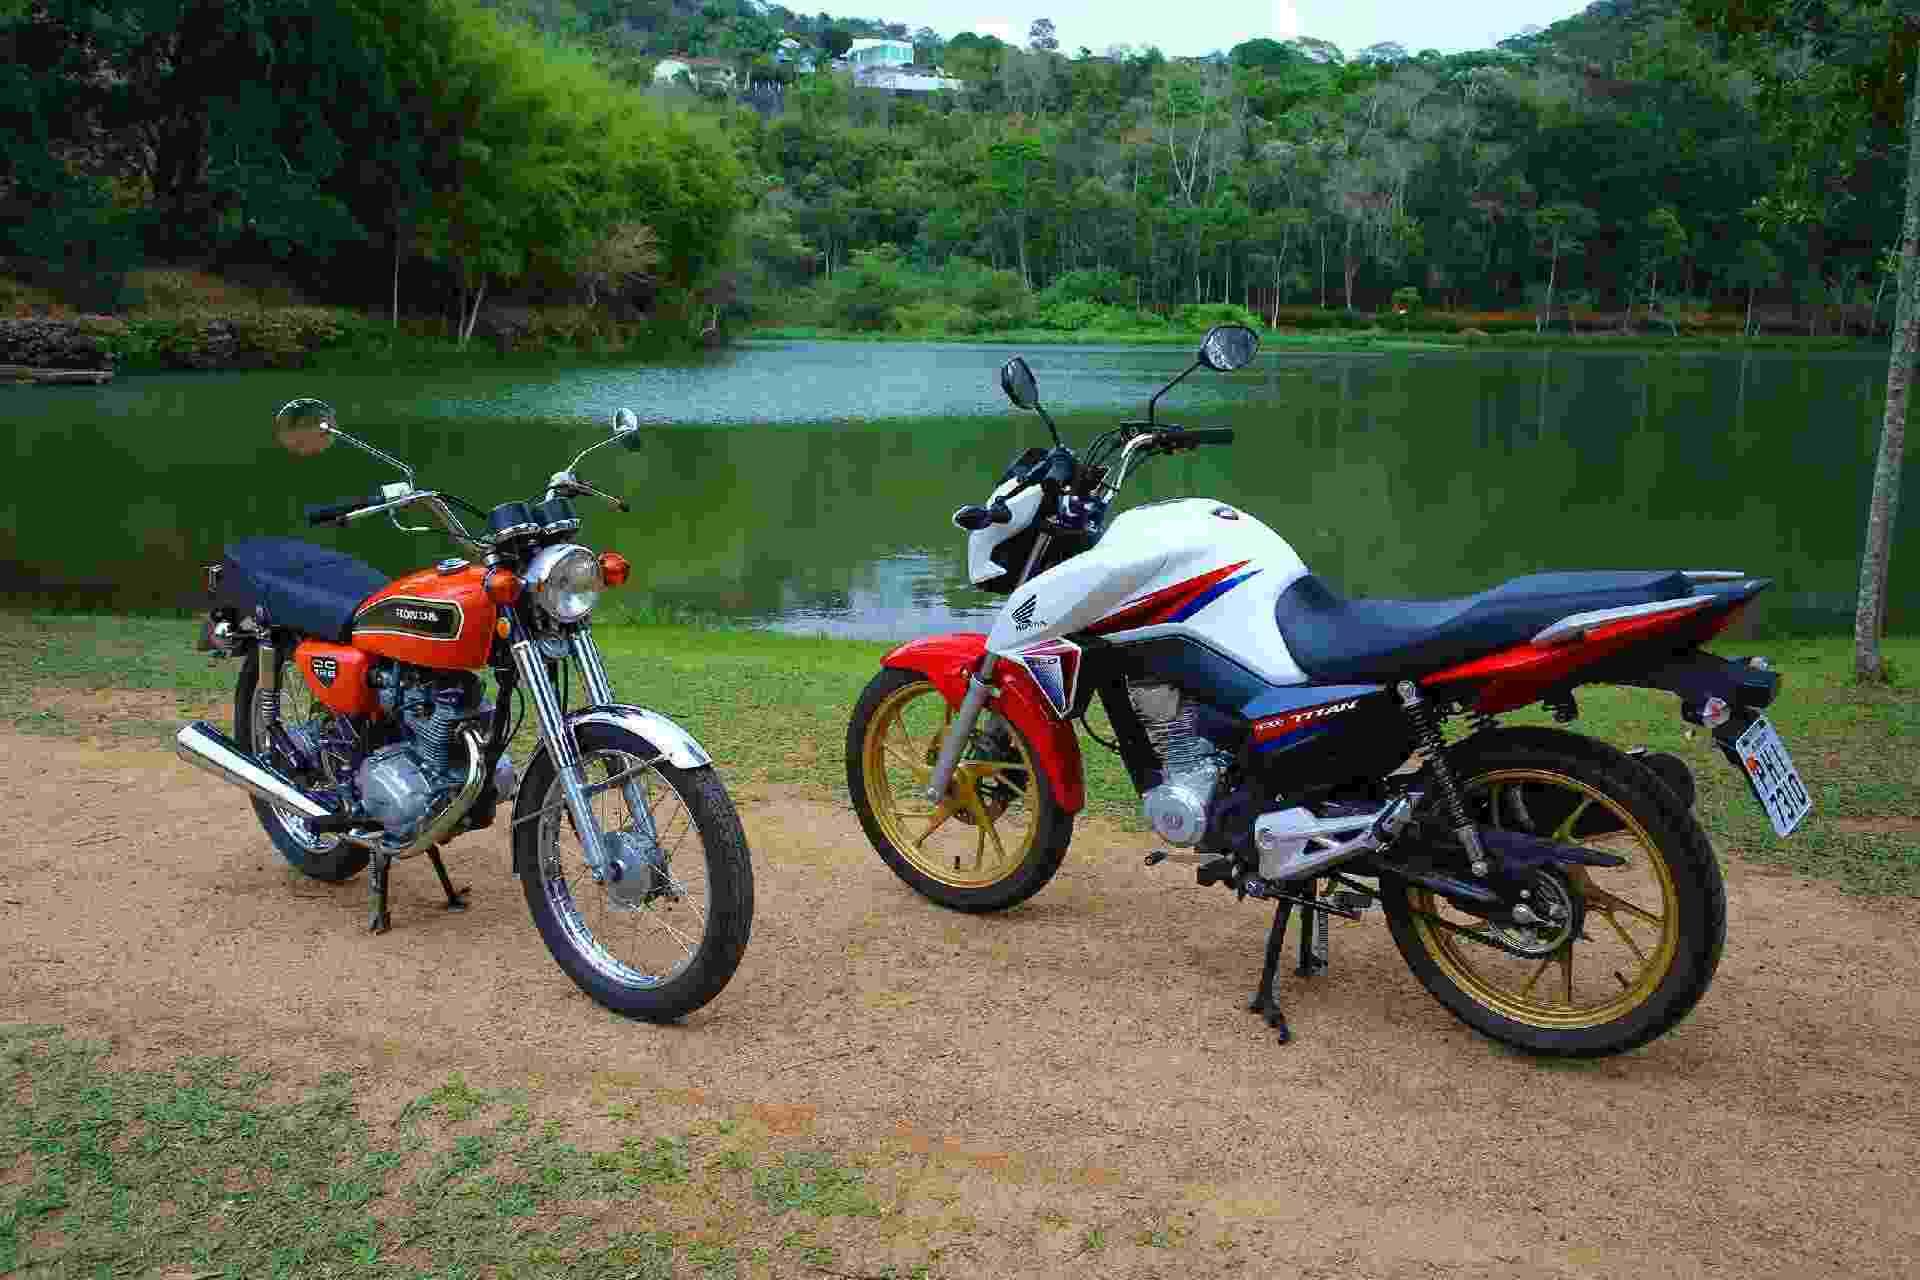 Honda CG 160 Titan 40 anos - Infomoto